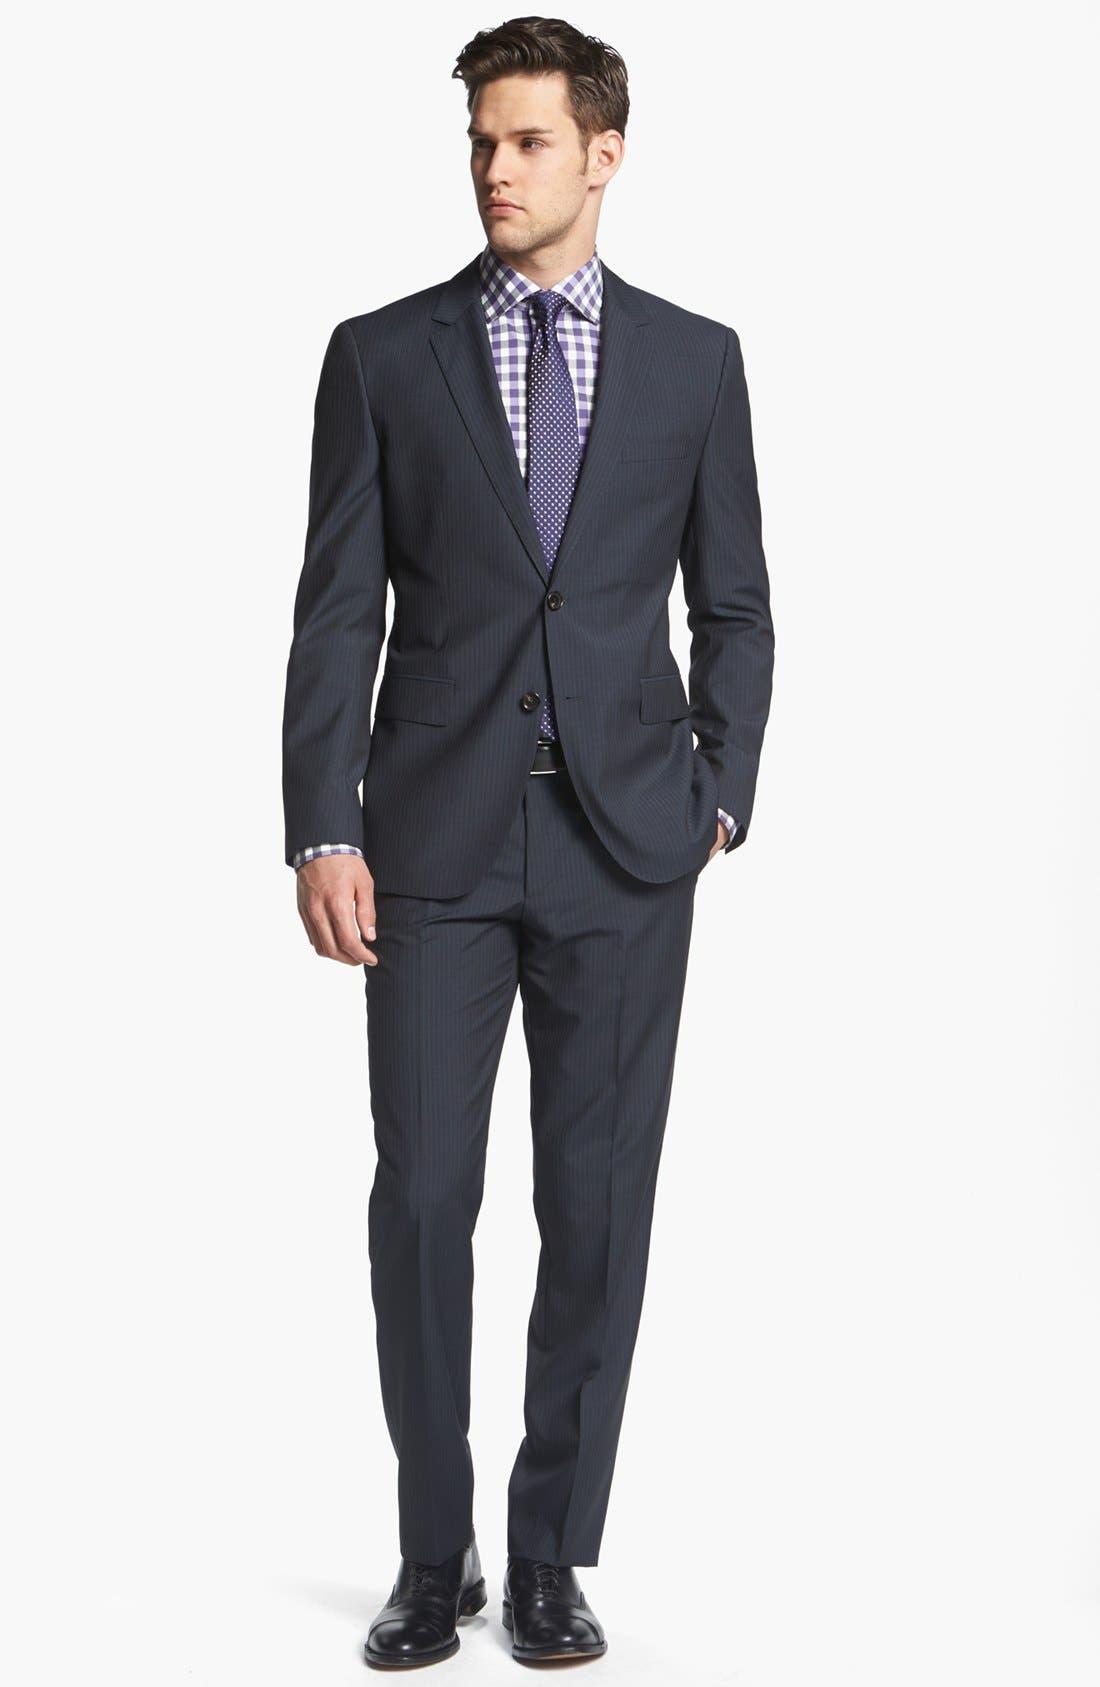 Alternate Image 1 Selected - BOSS Black Suit & Calibrate Dress Shirt